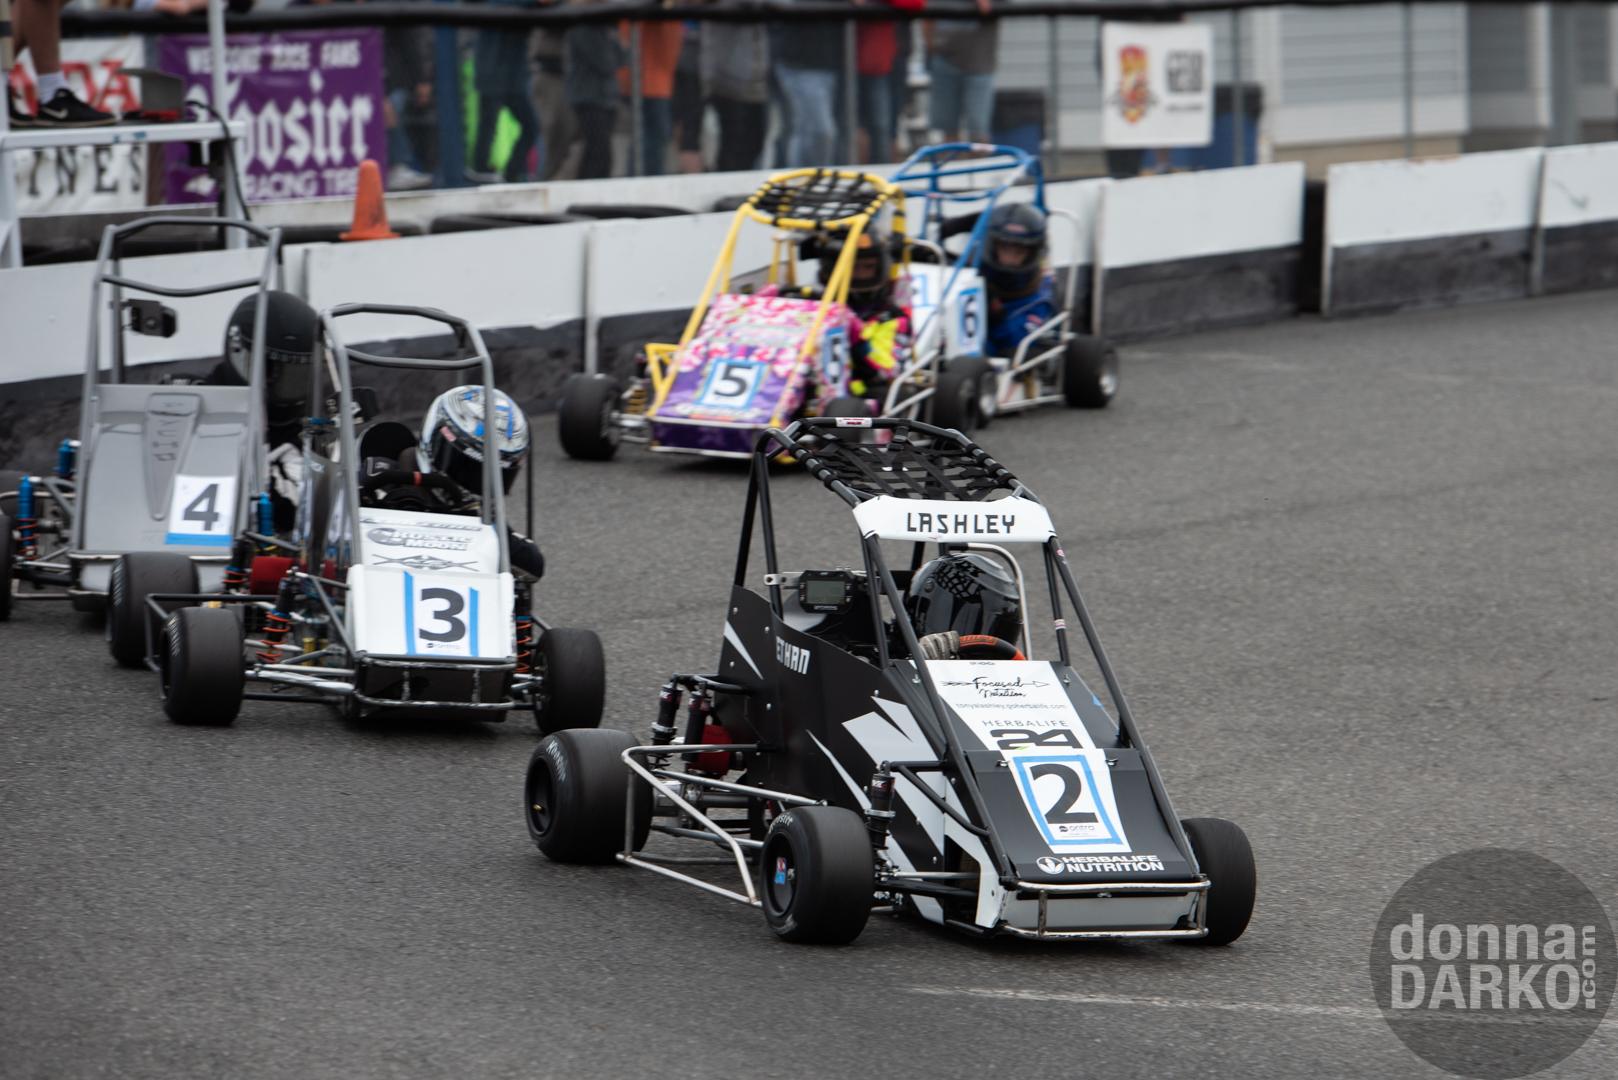 QWMA (Racing) 8-11-2019 DSC_5783.jpg